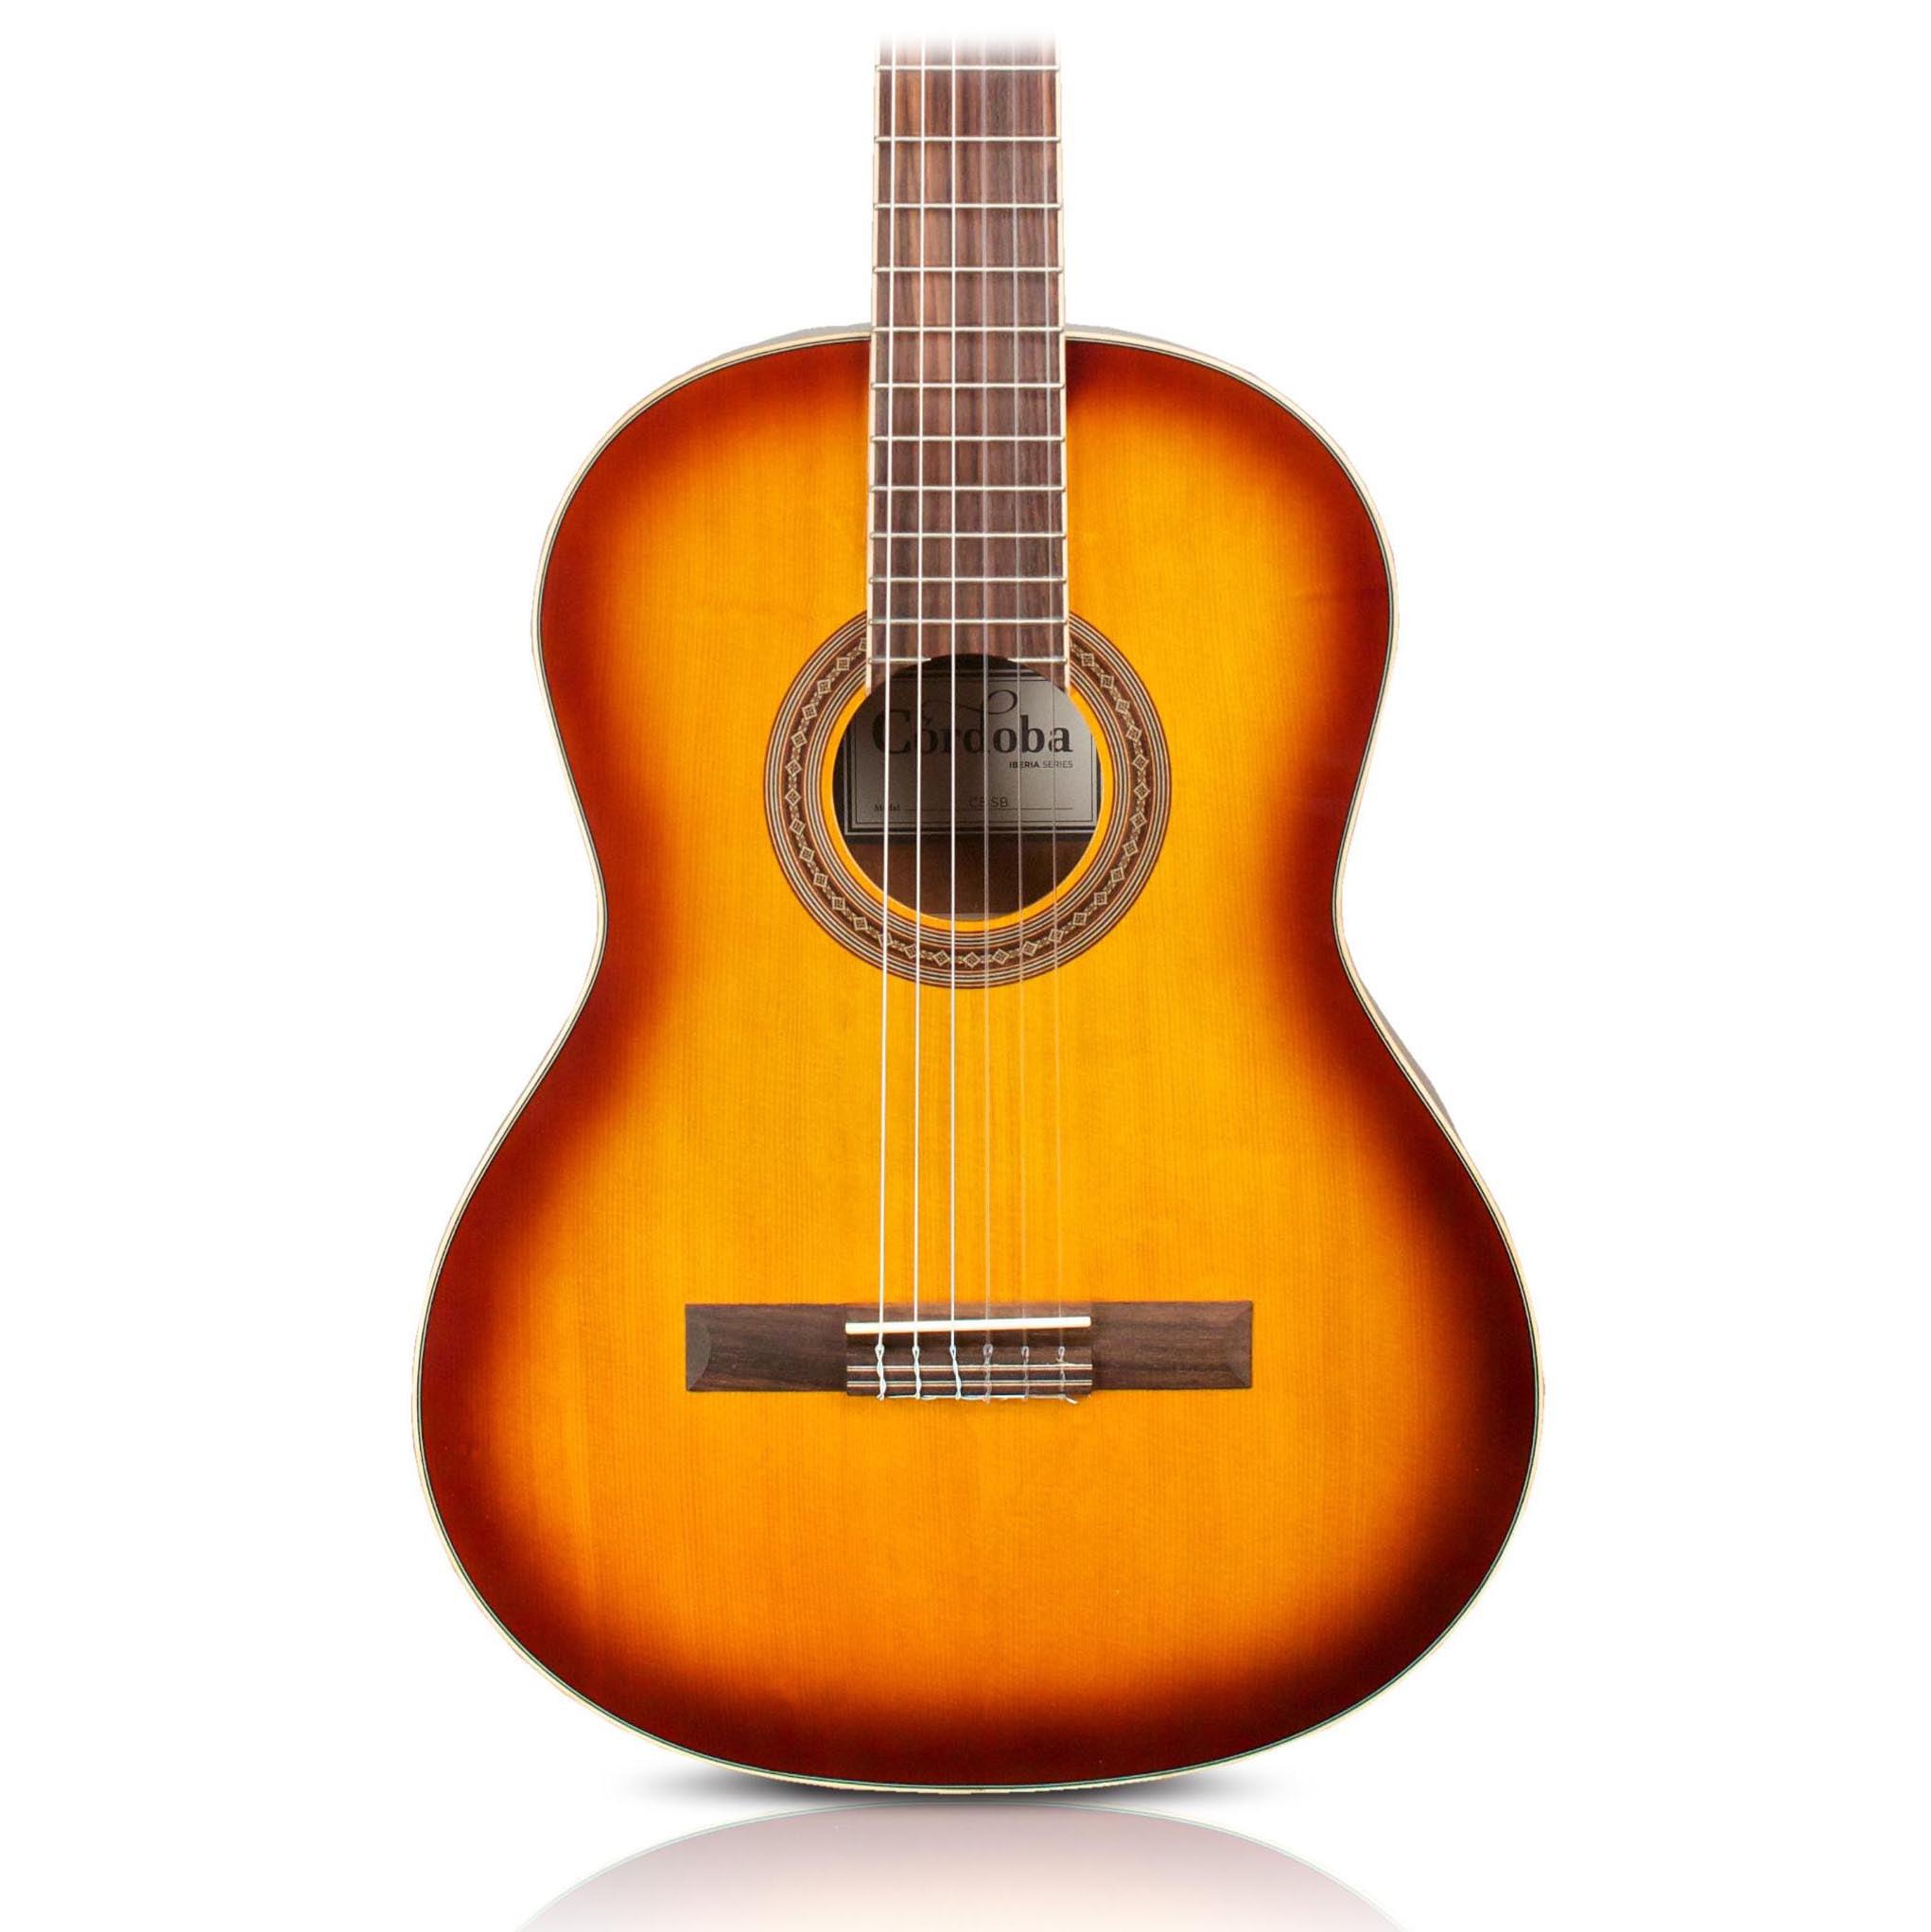 Cordoba C5 Classical Spruce Top Acoustic Guitar Sunburst